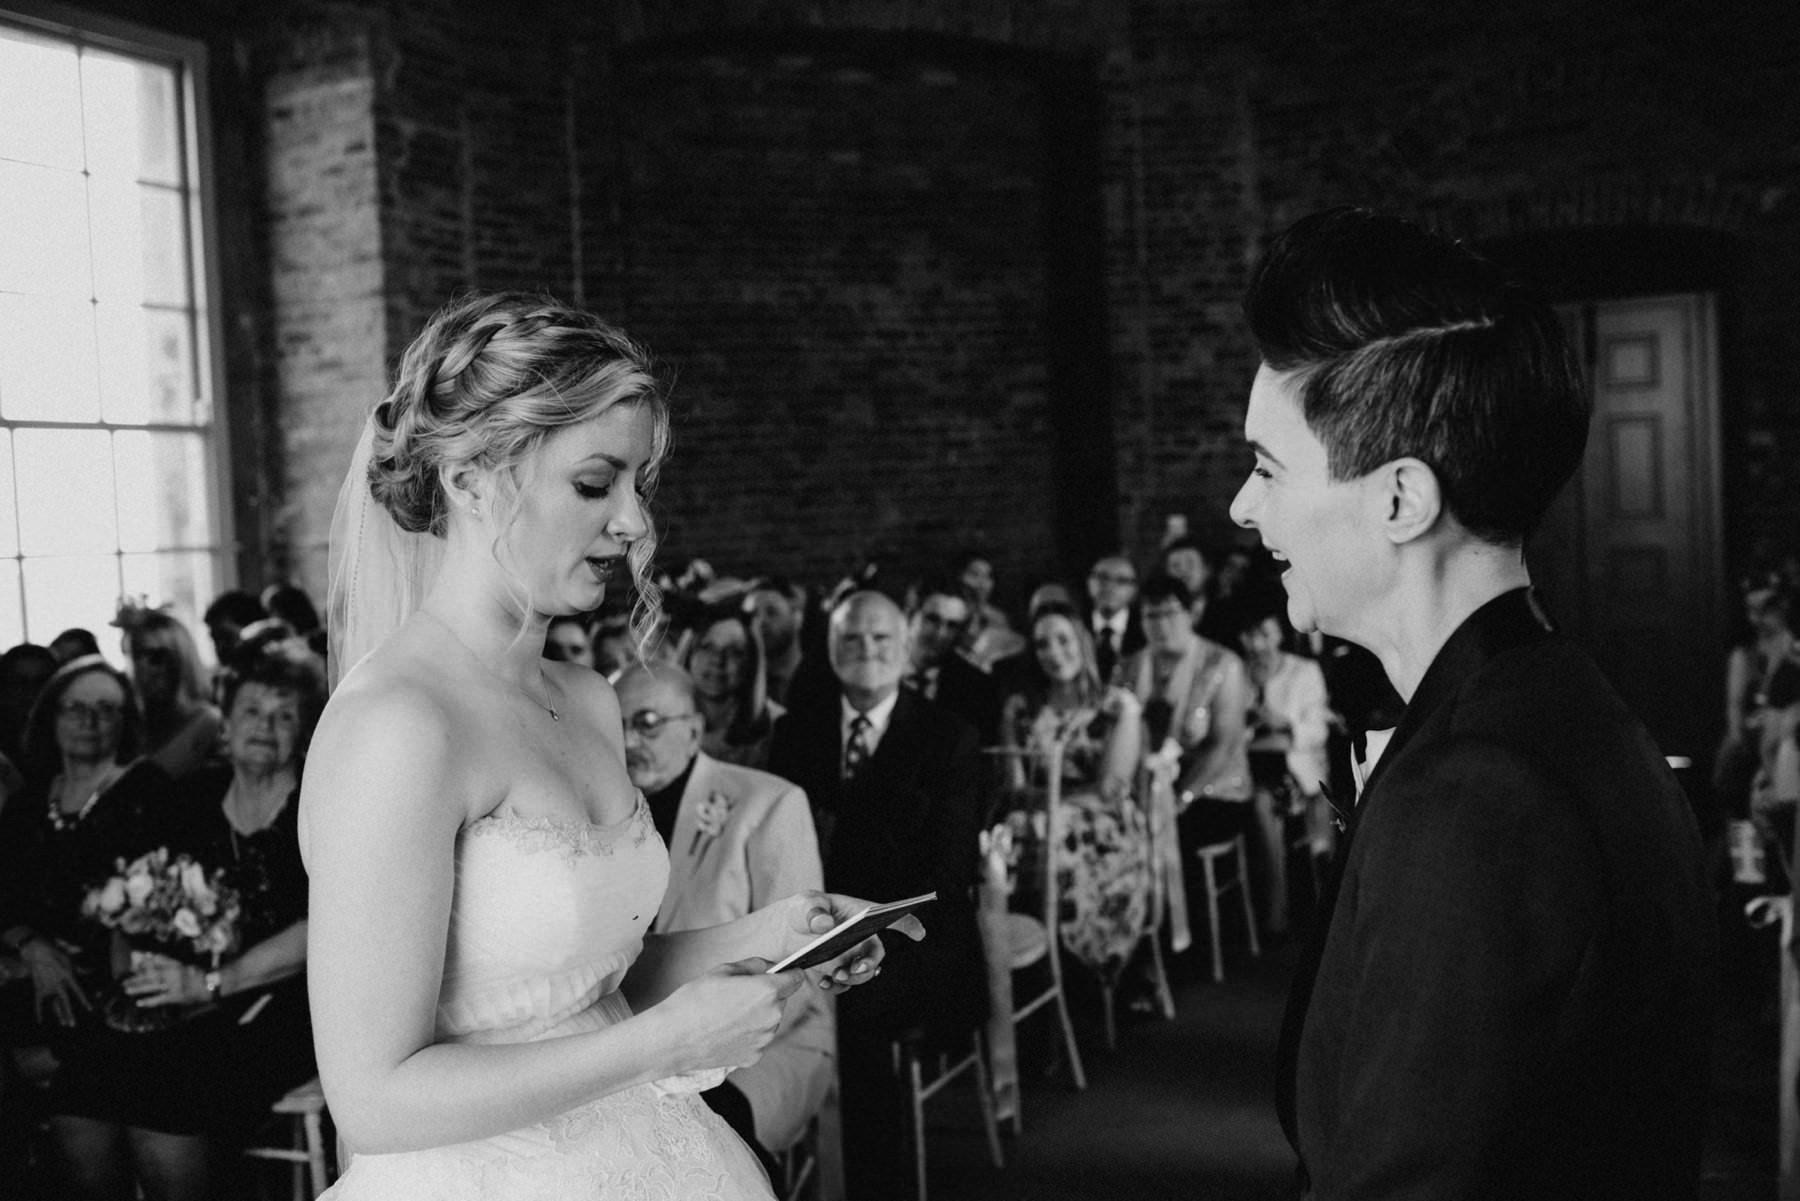 emotional wedding ceremony at mussenden temple northern ireland